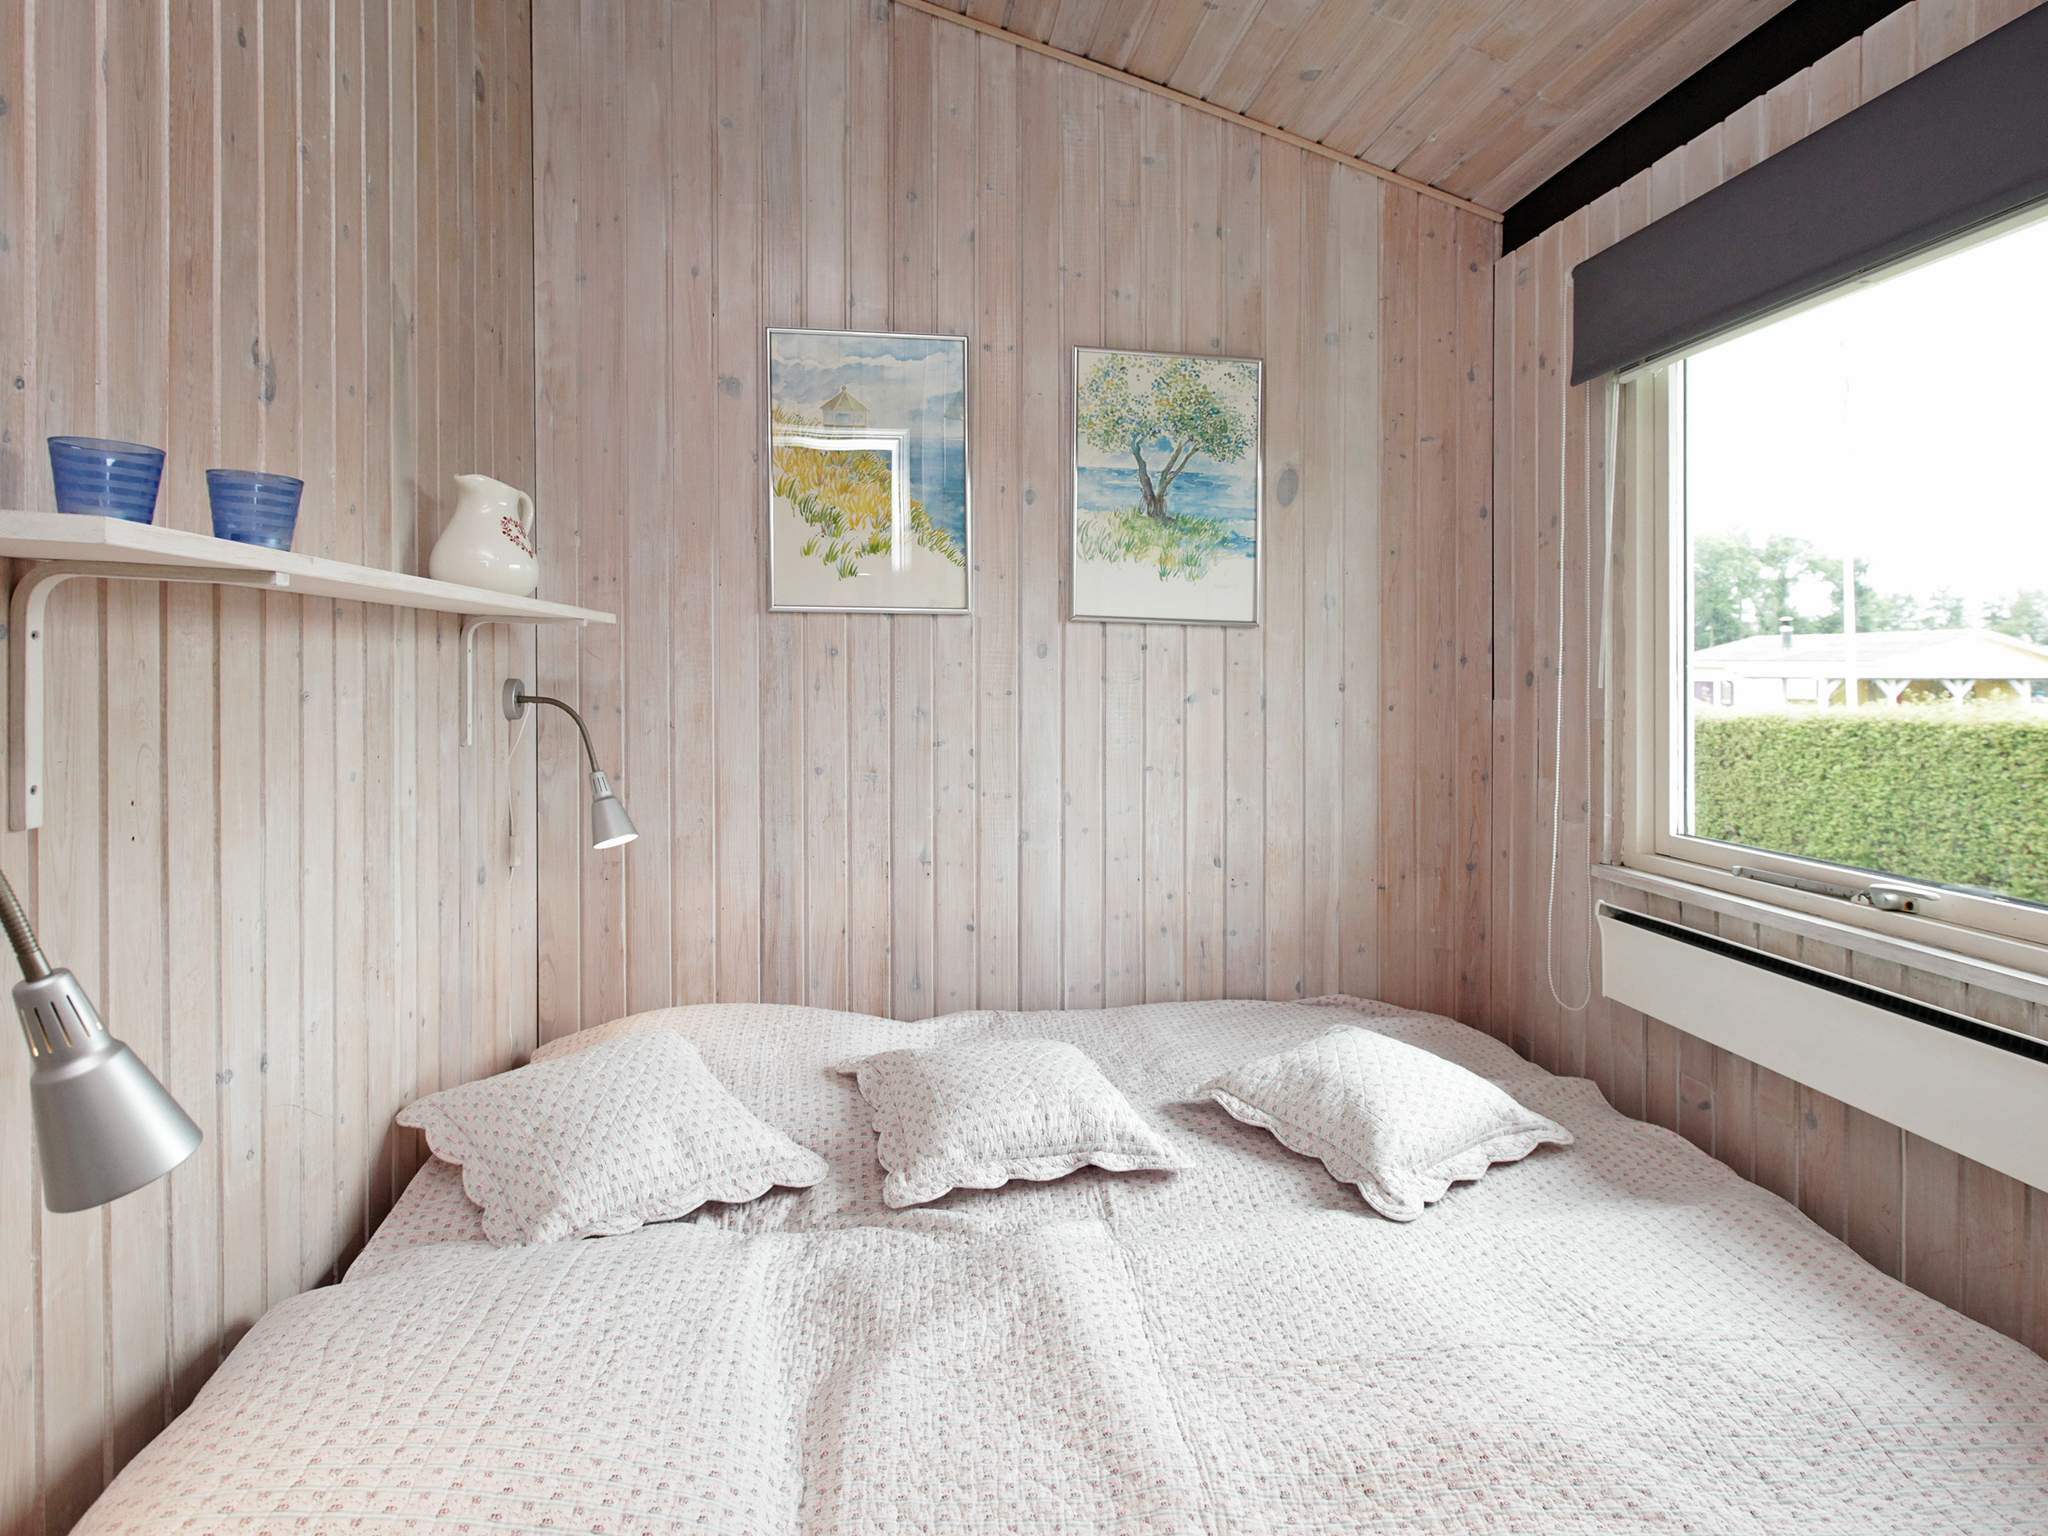 Ferienhaus As Vig (84917), Horsens, , Ostjütland, Dänemark, Bild 11